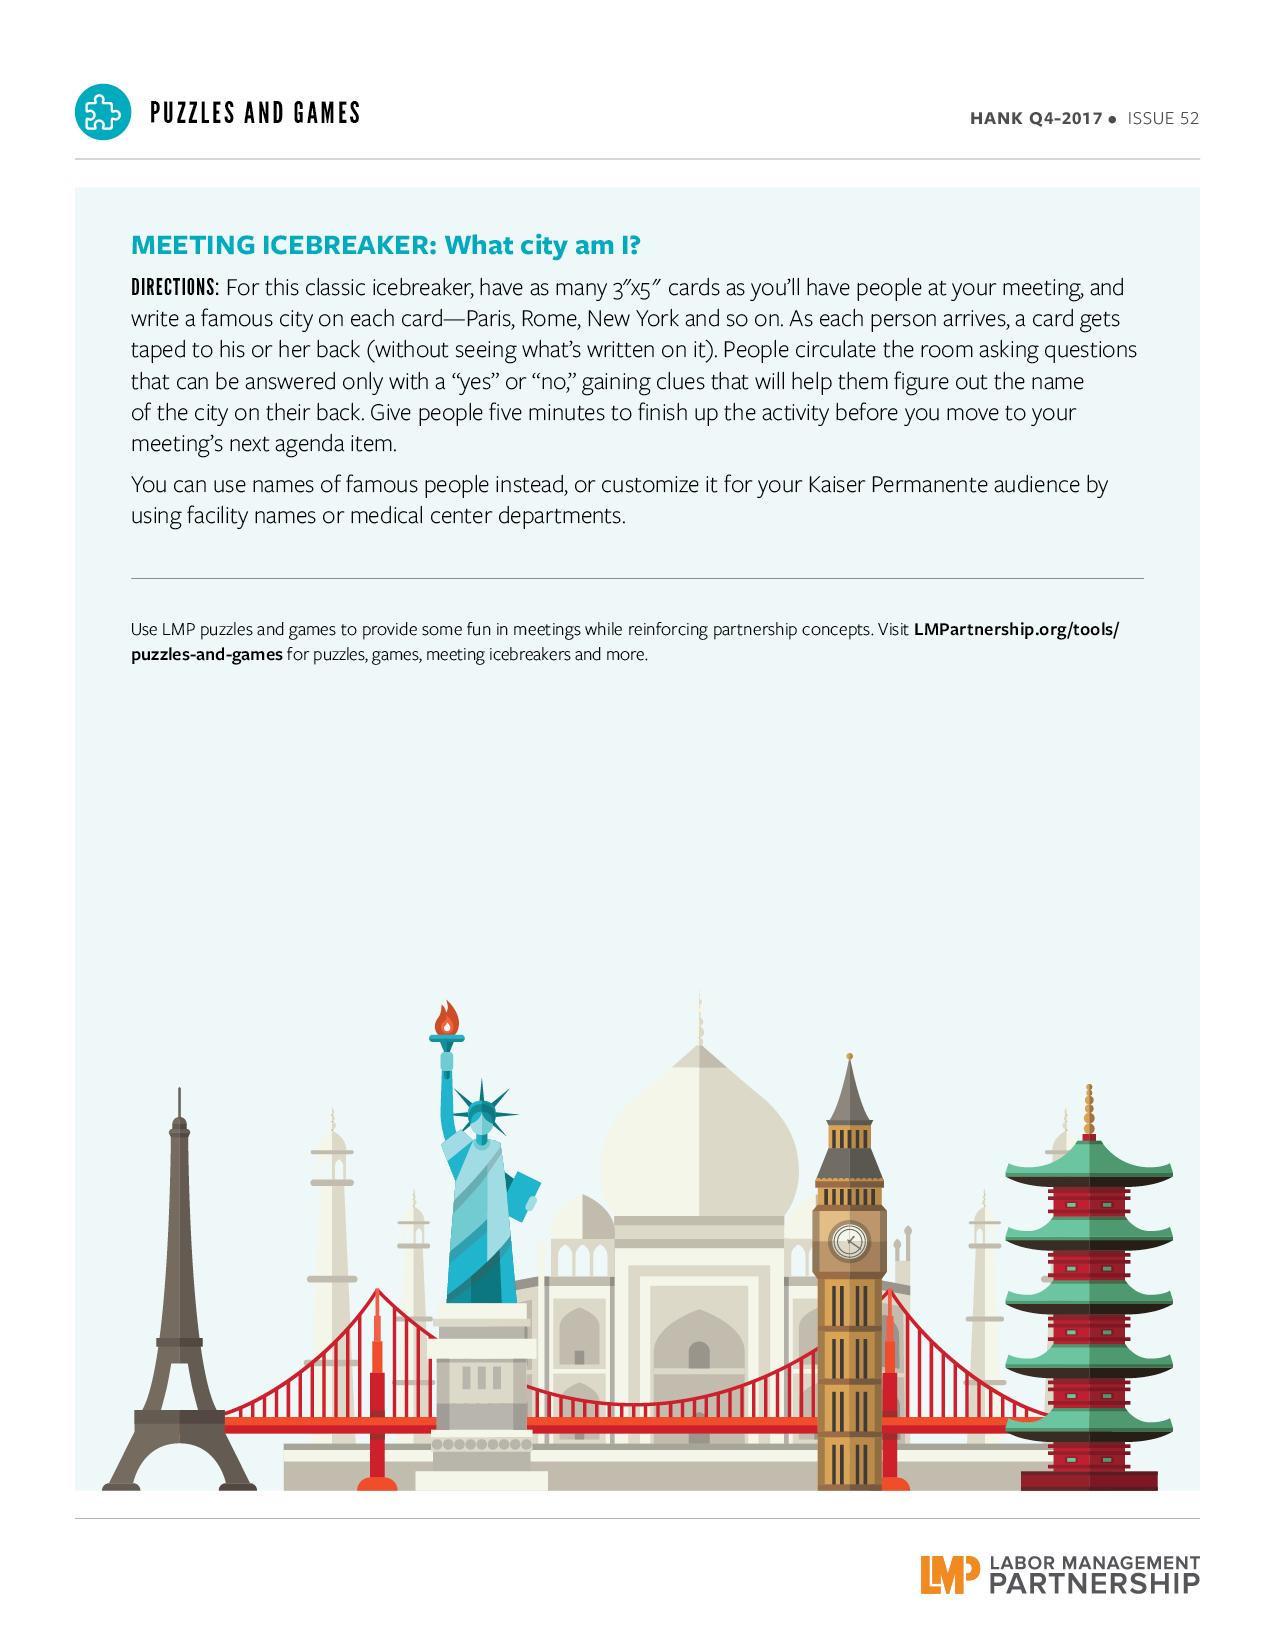 instructions for meeting icebreaker, image of iconic city landmarks